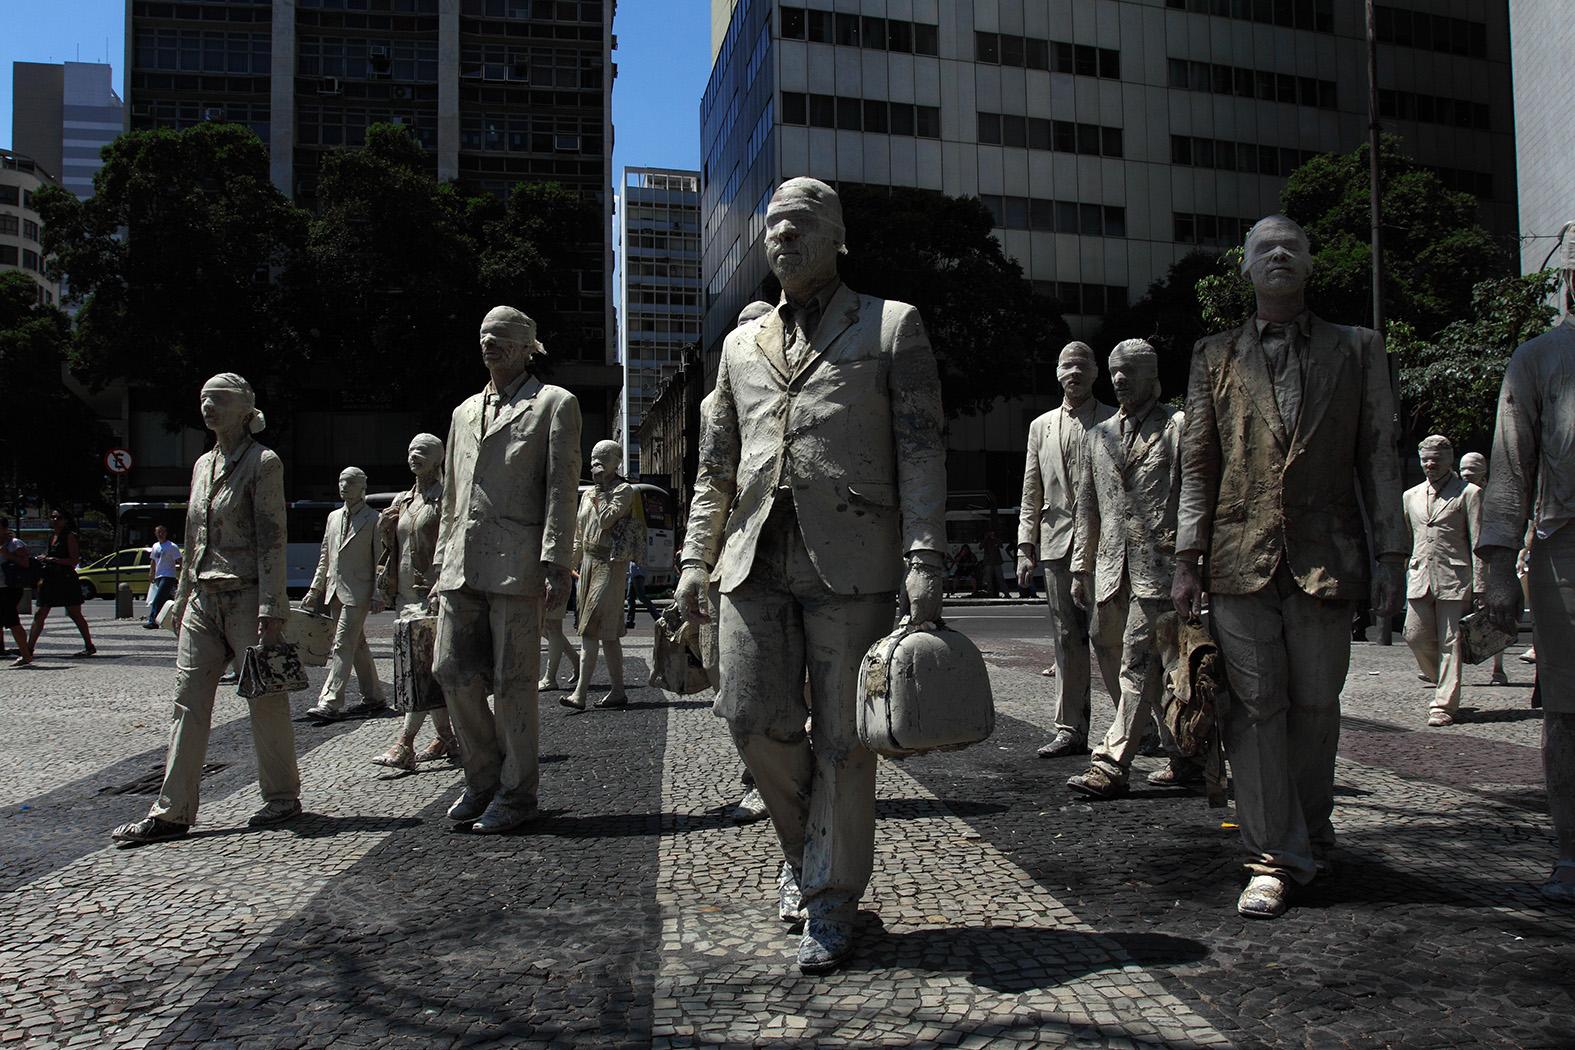 Desumanos (2012) - Ricardo Beliel